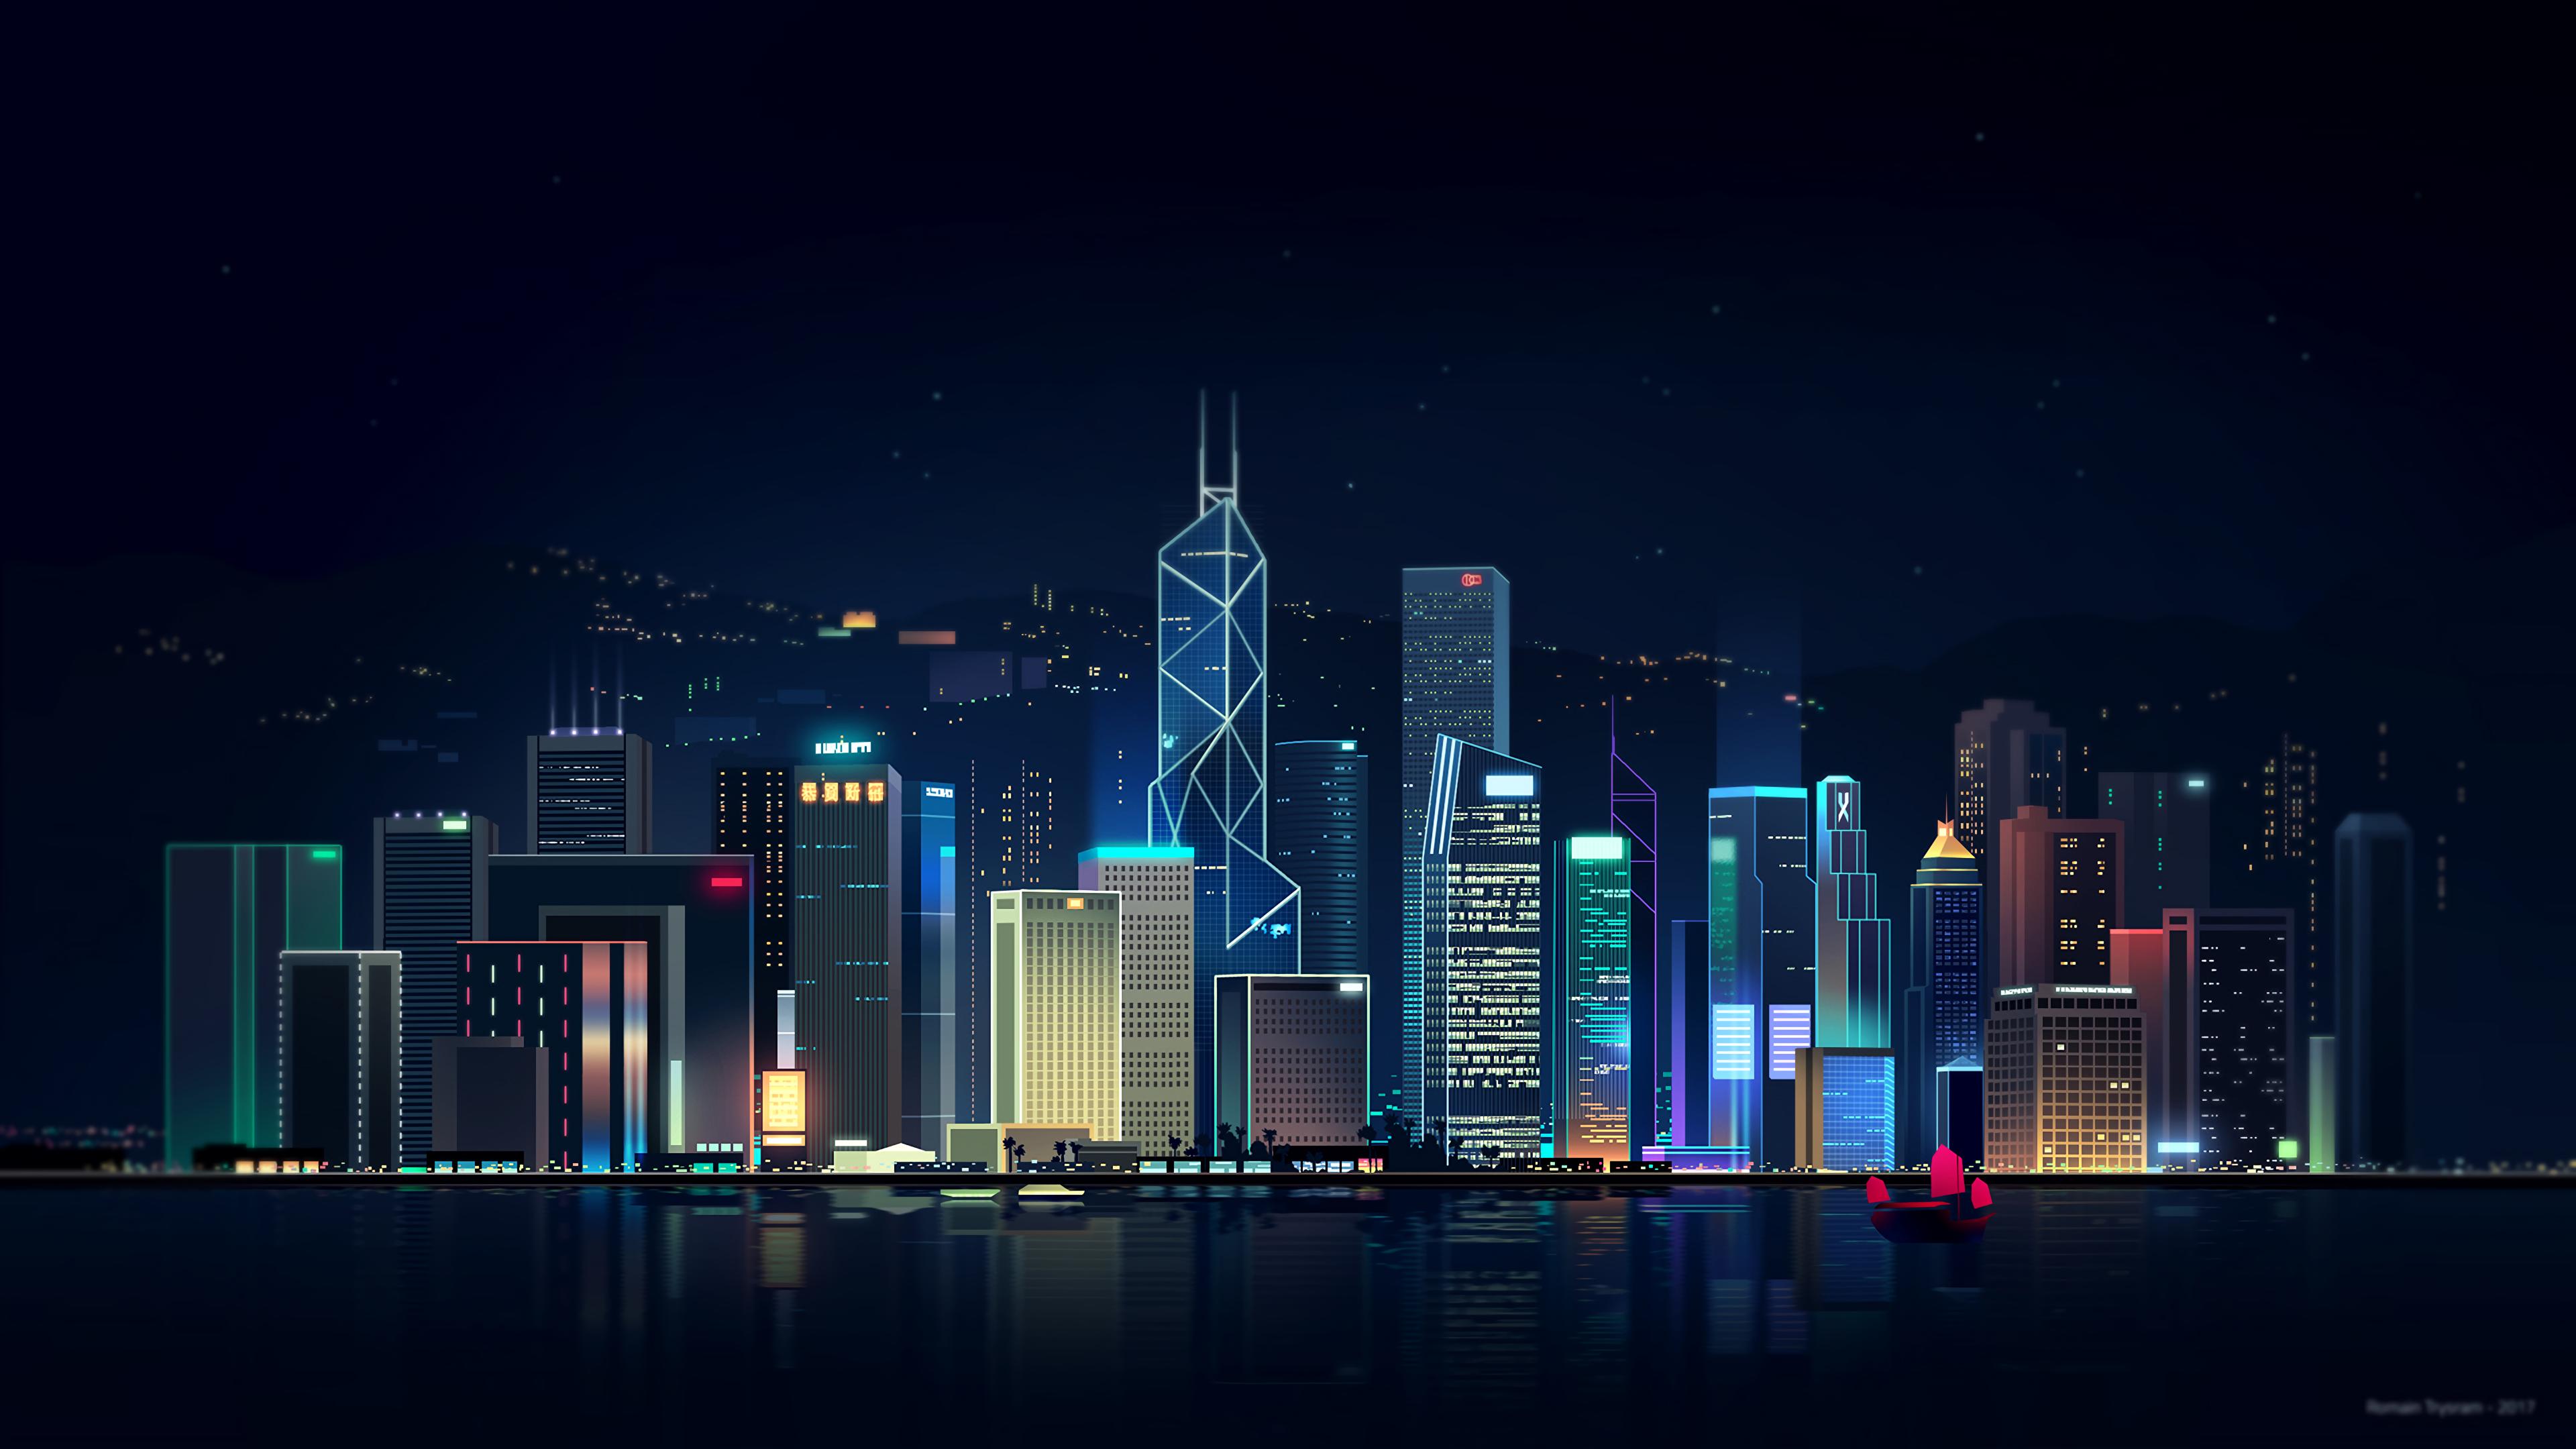 Neon City By Romain Trystram 3840x2160 In 2020 City Wallpaper Skyline Futuristic City